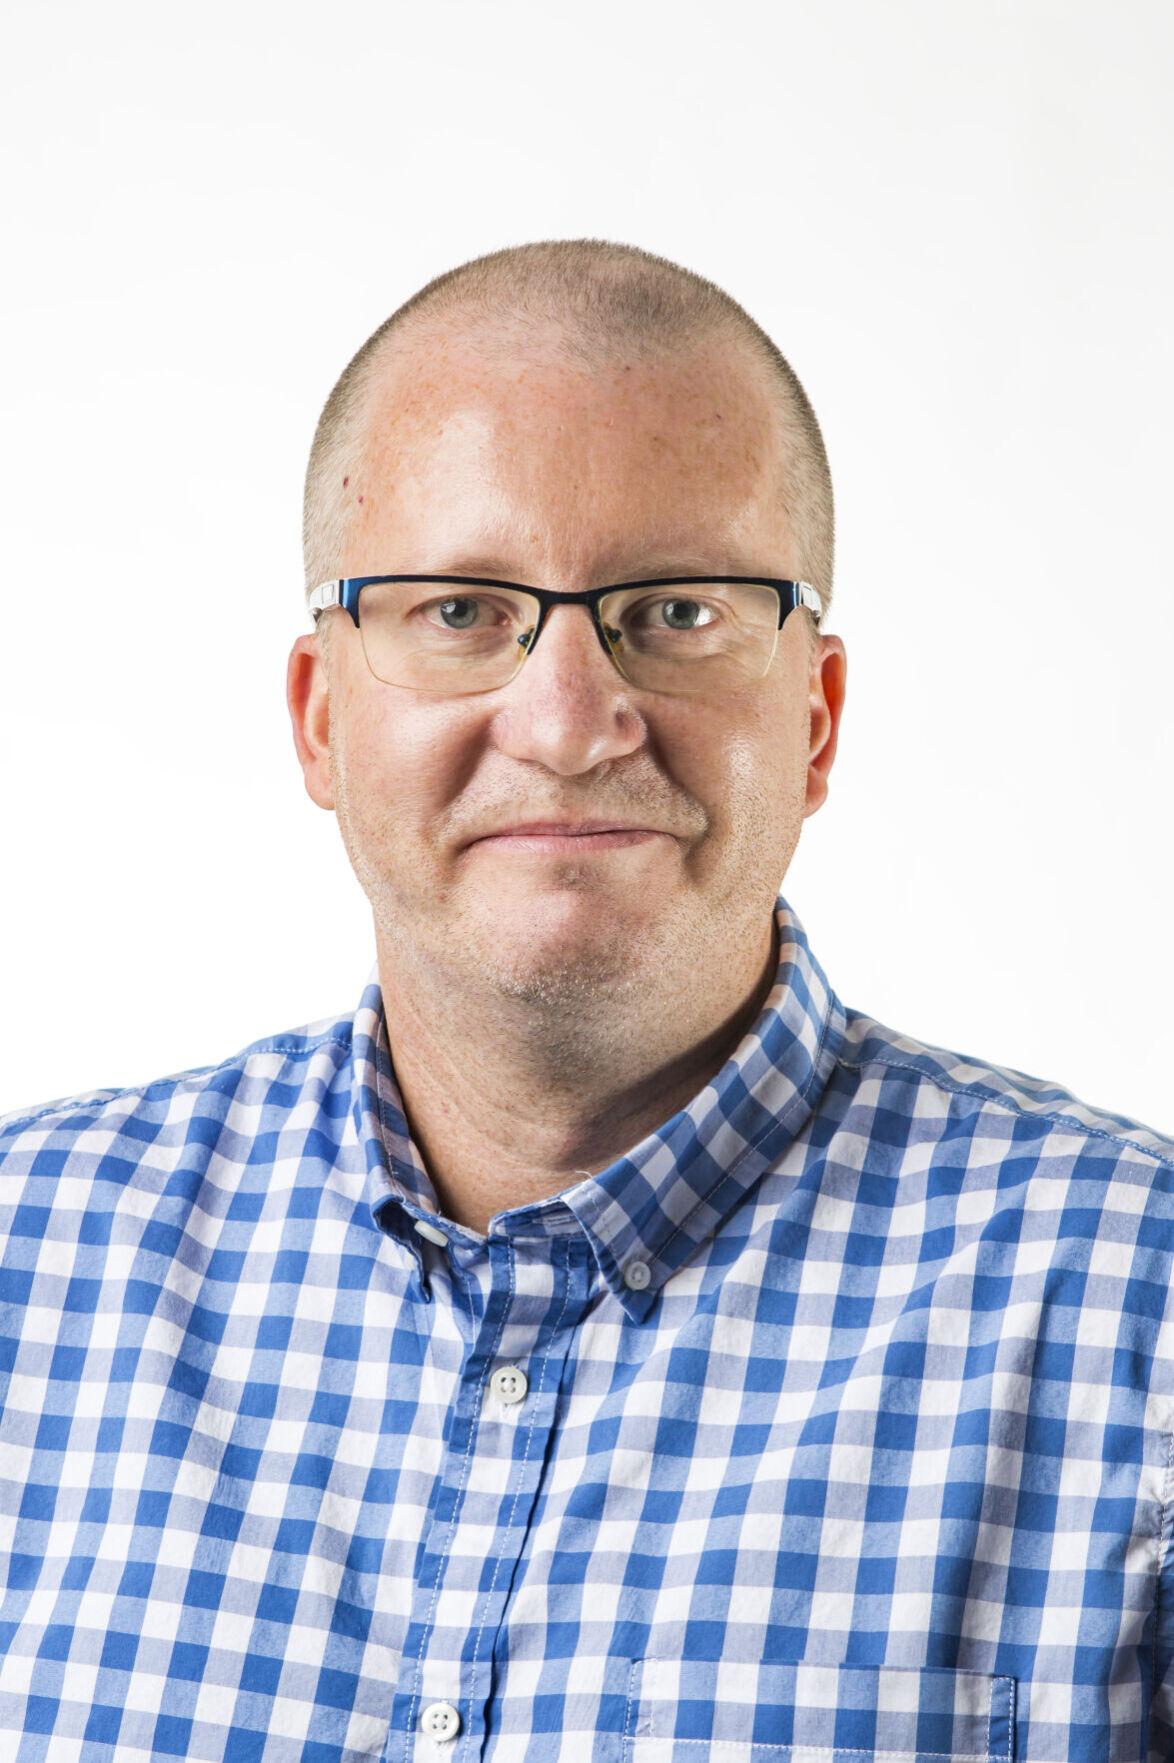 Erick Peterson